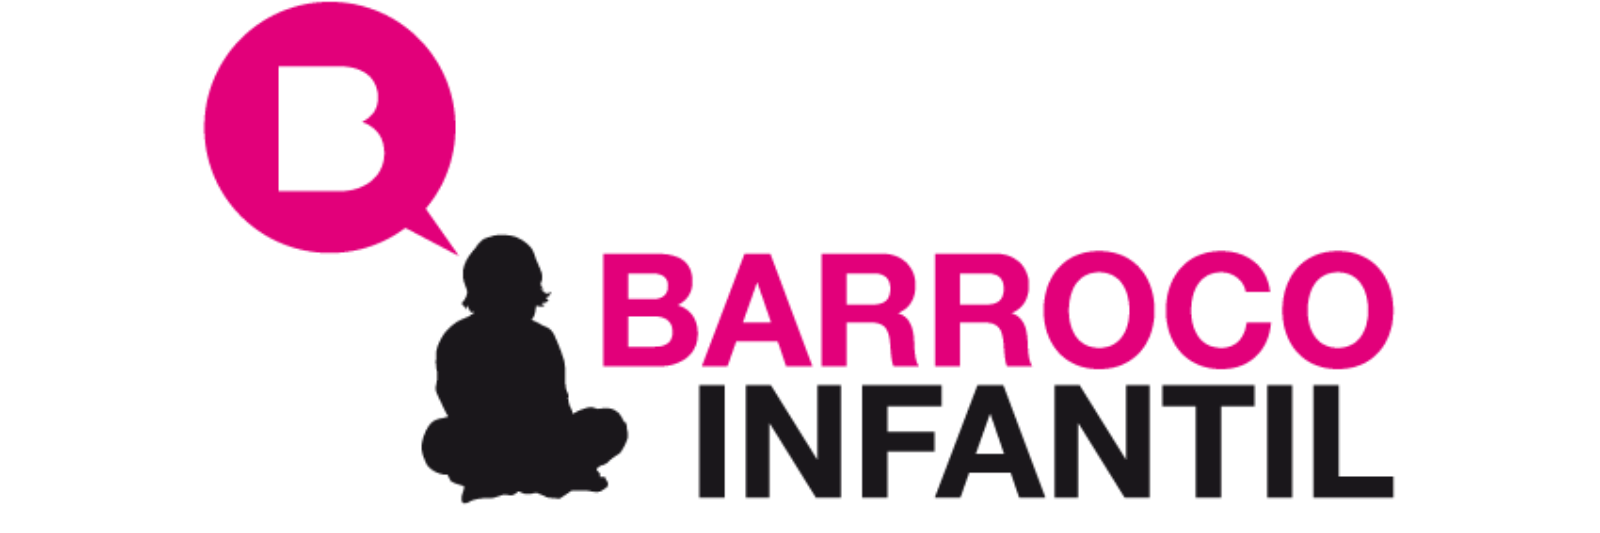 Barroco Infantil